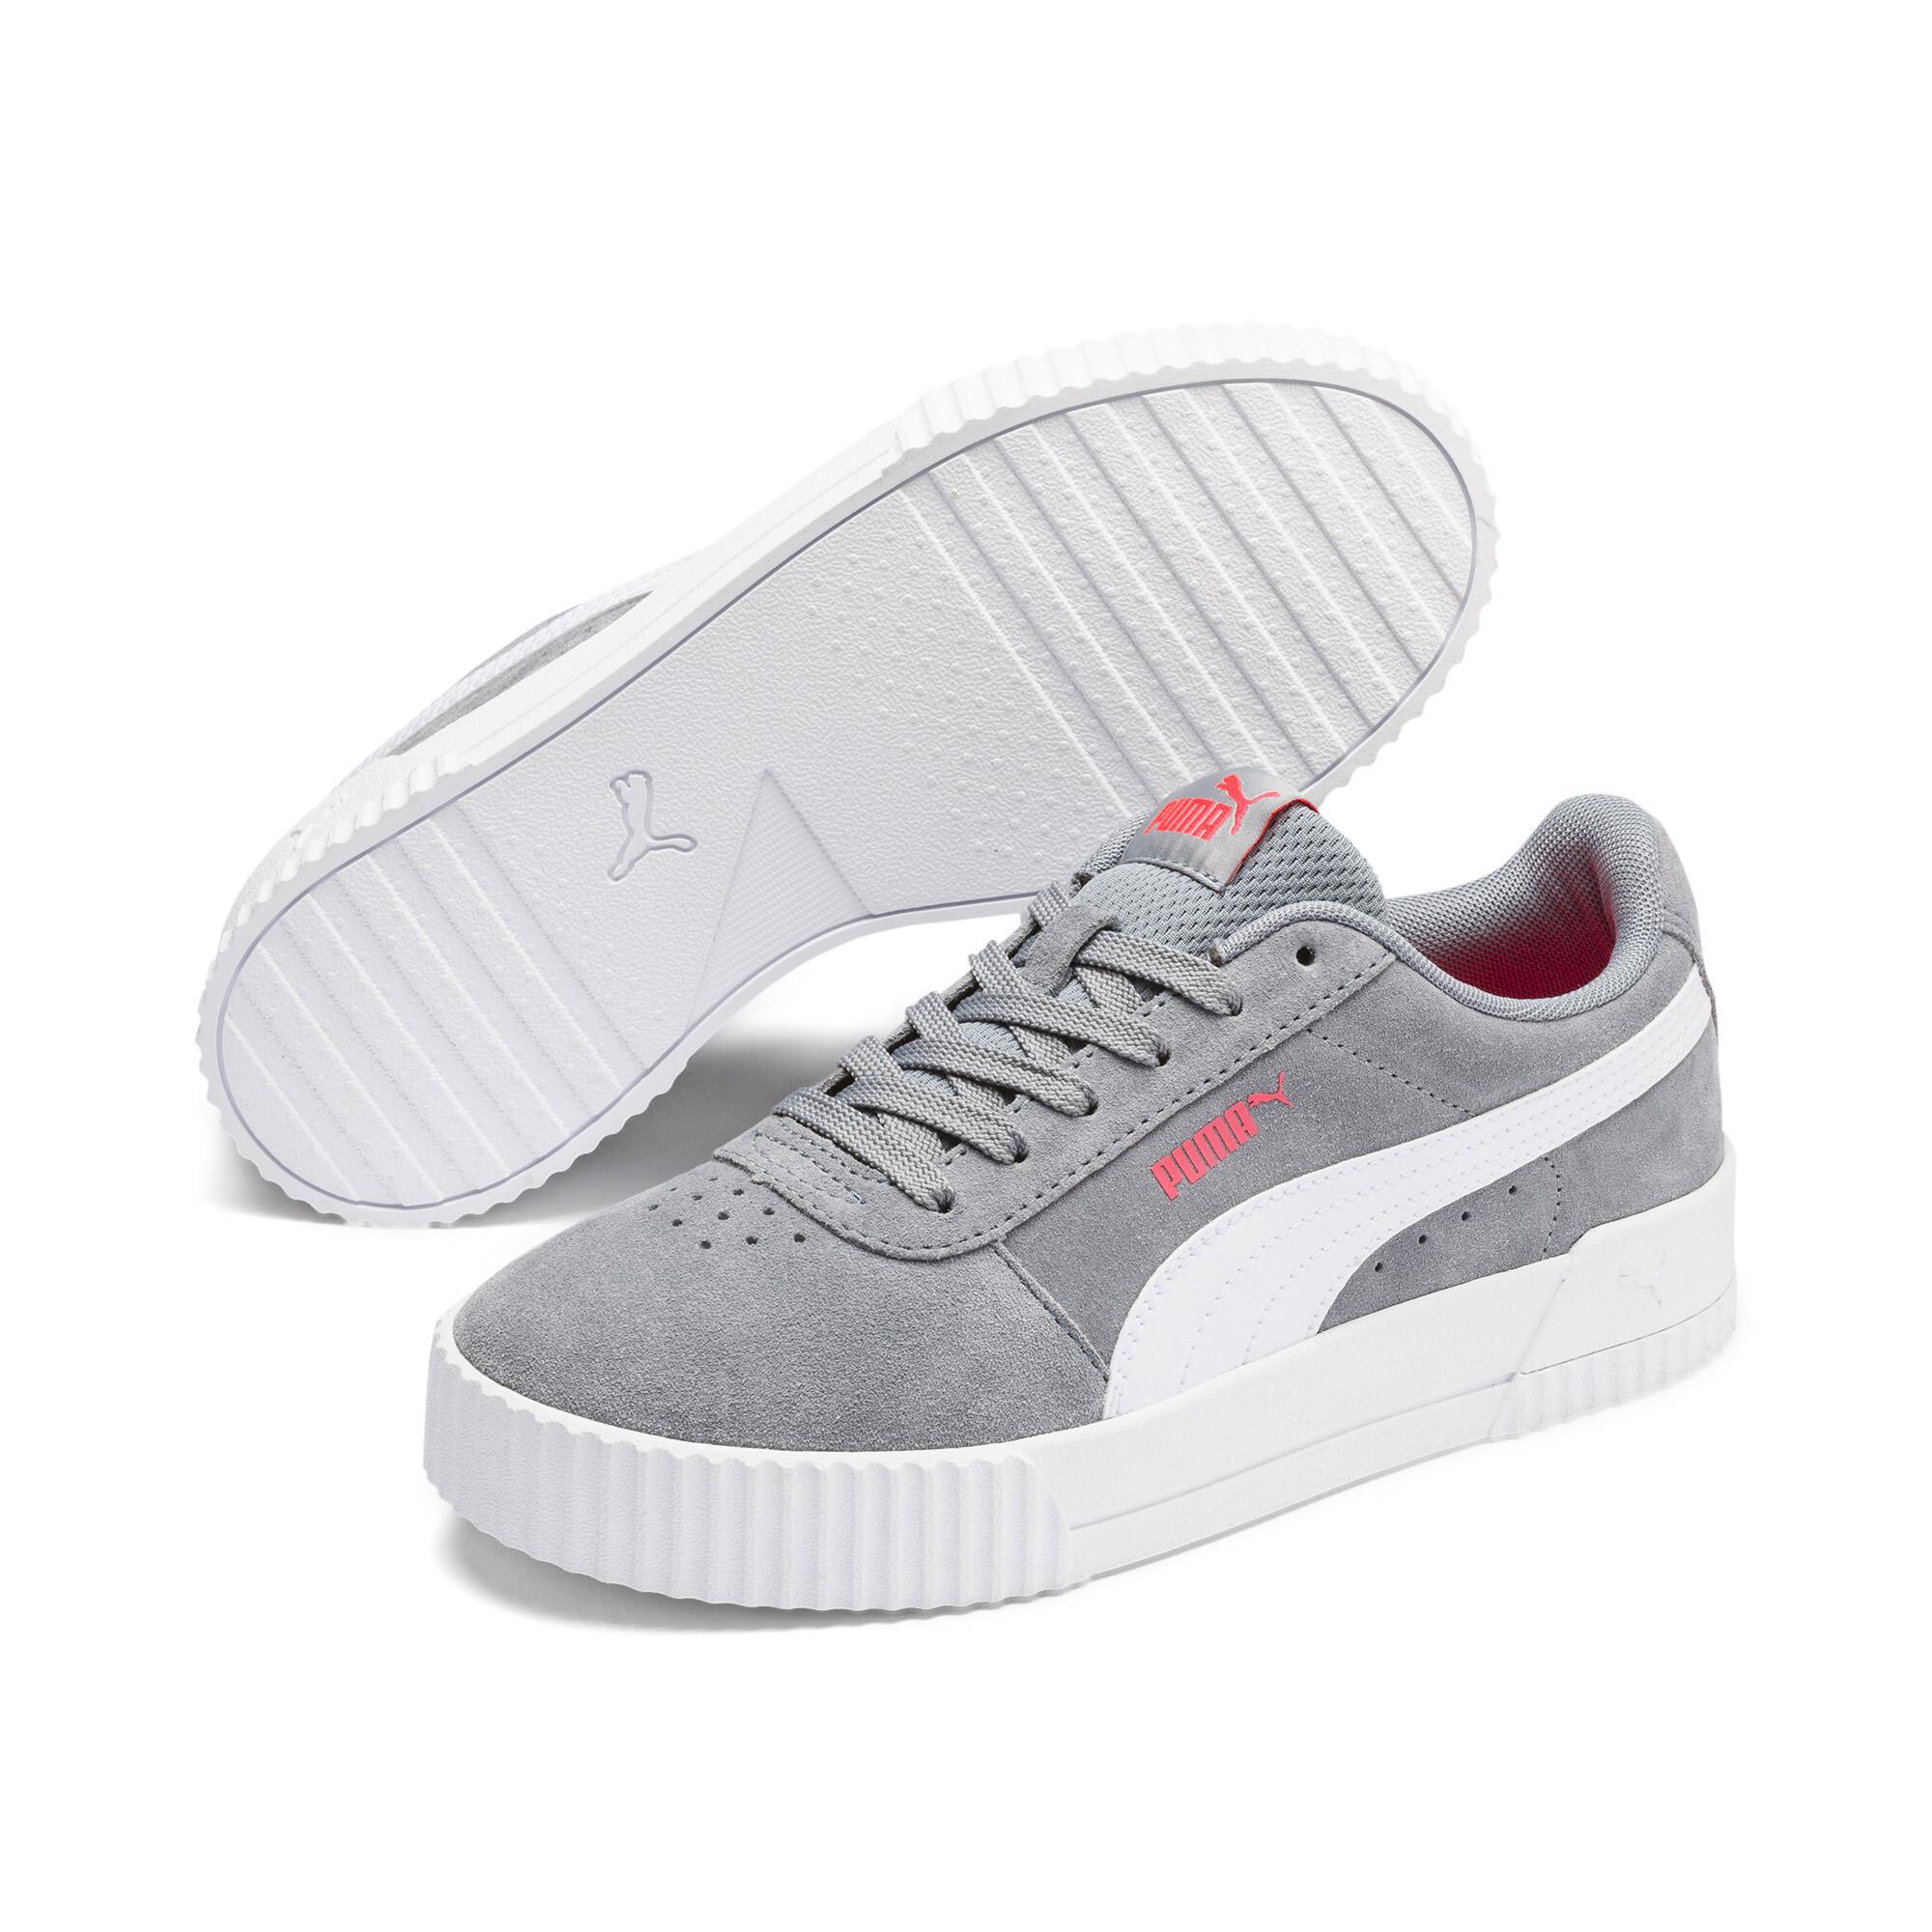 Details about PUMA Carina Women's Sneakers Women Shoe Basics